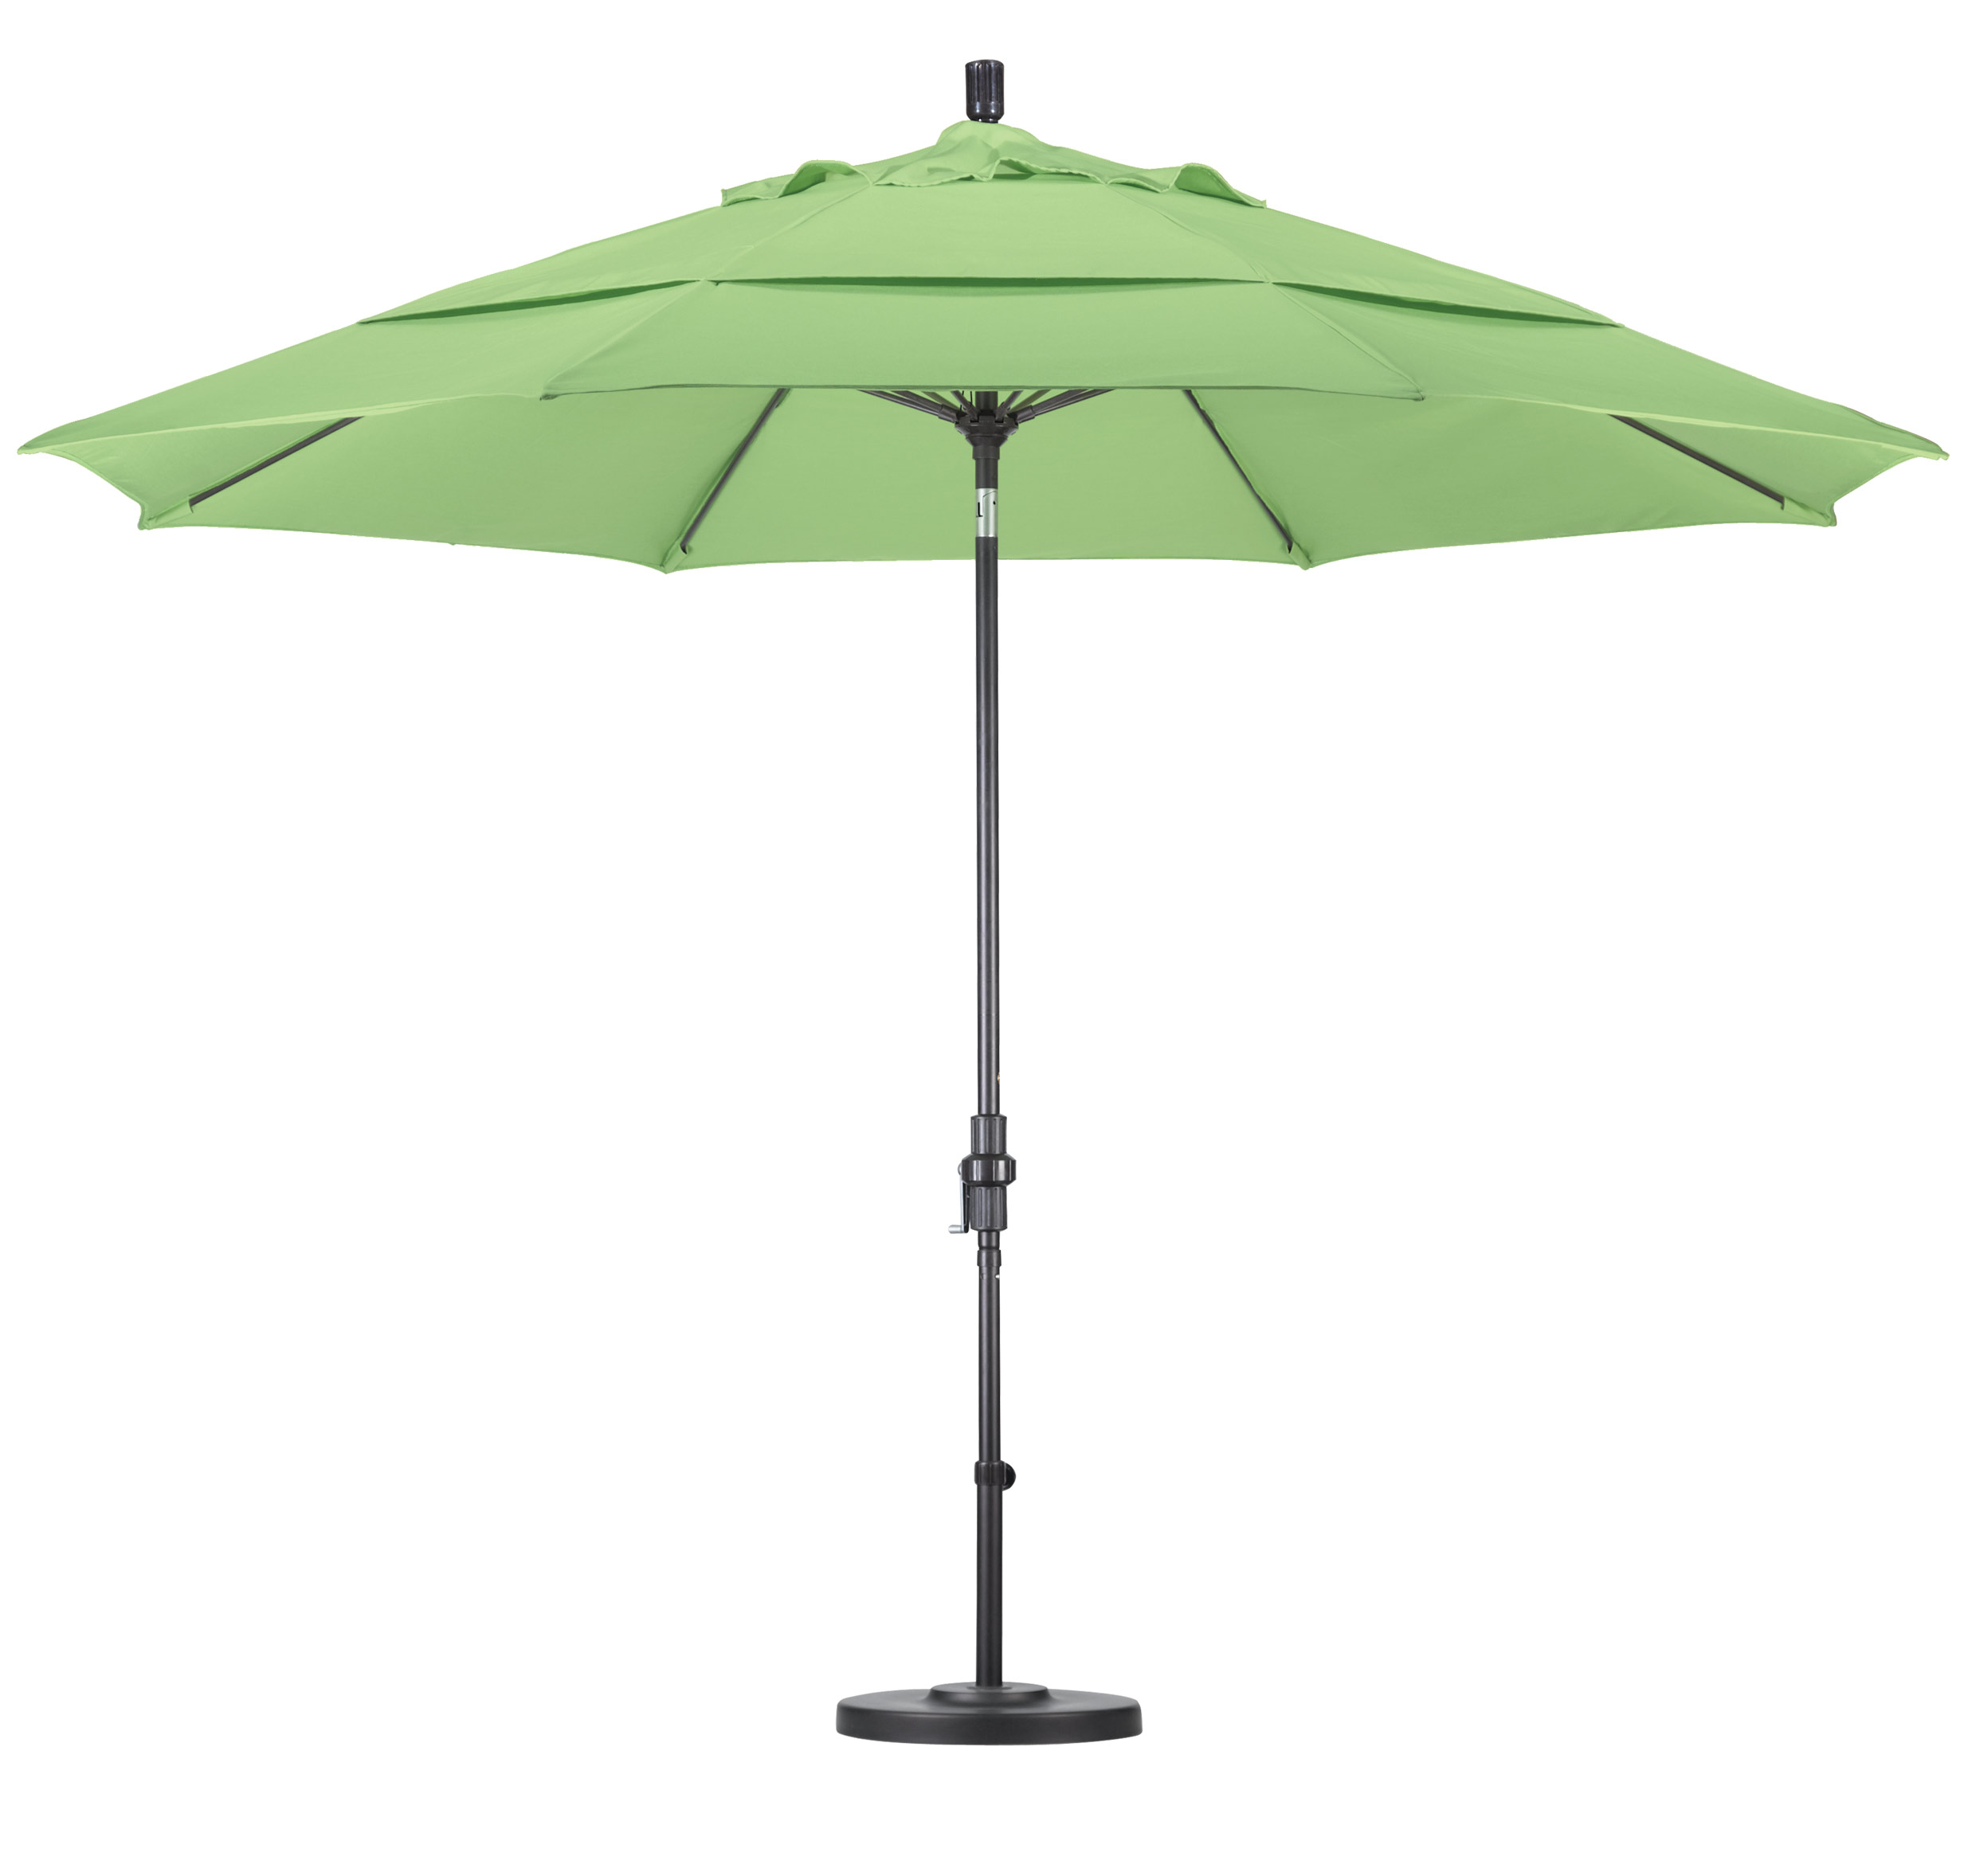 Galtech 11 Auto Tilt Patio Umbrella W LED Lights